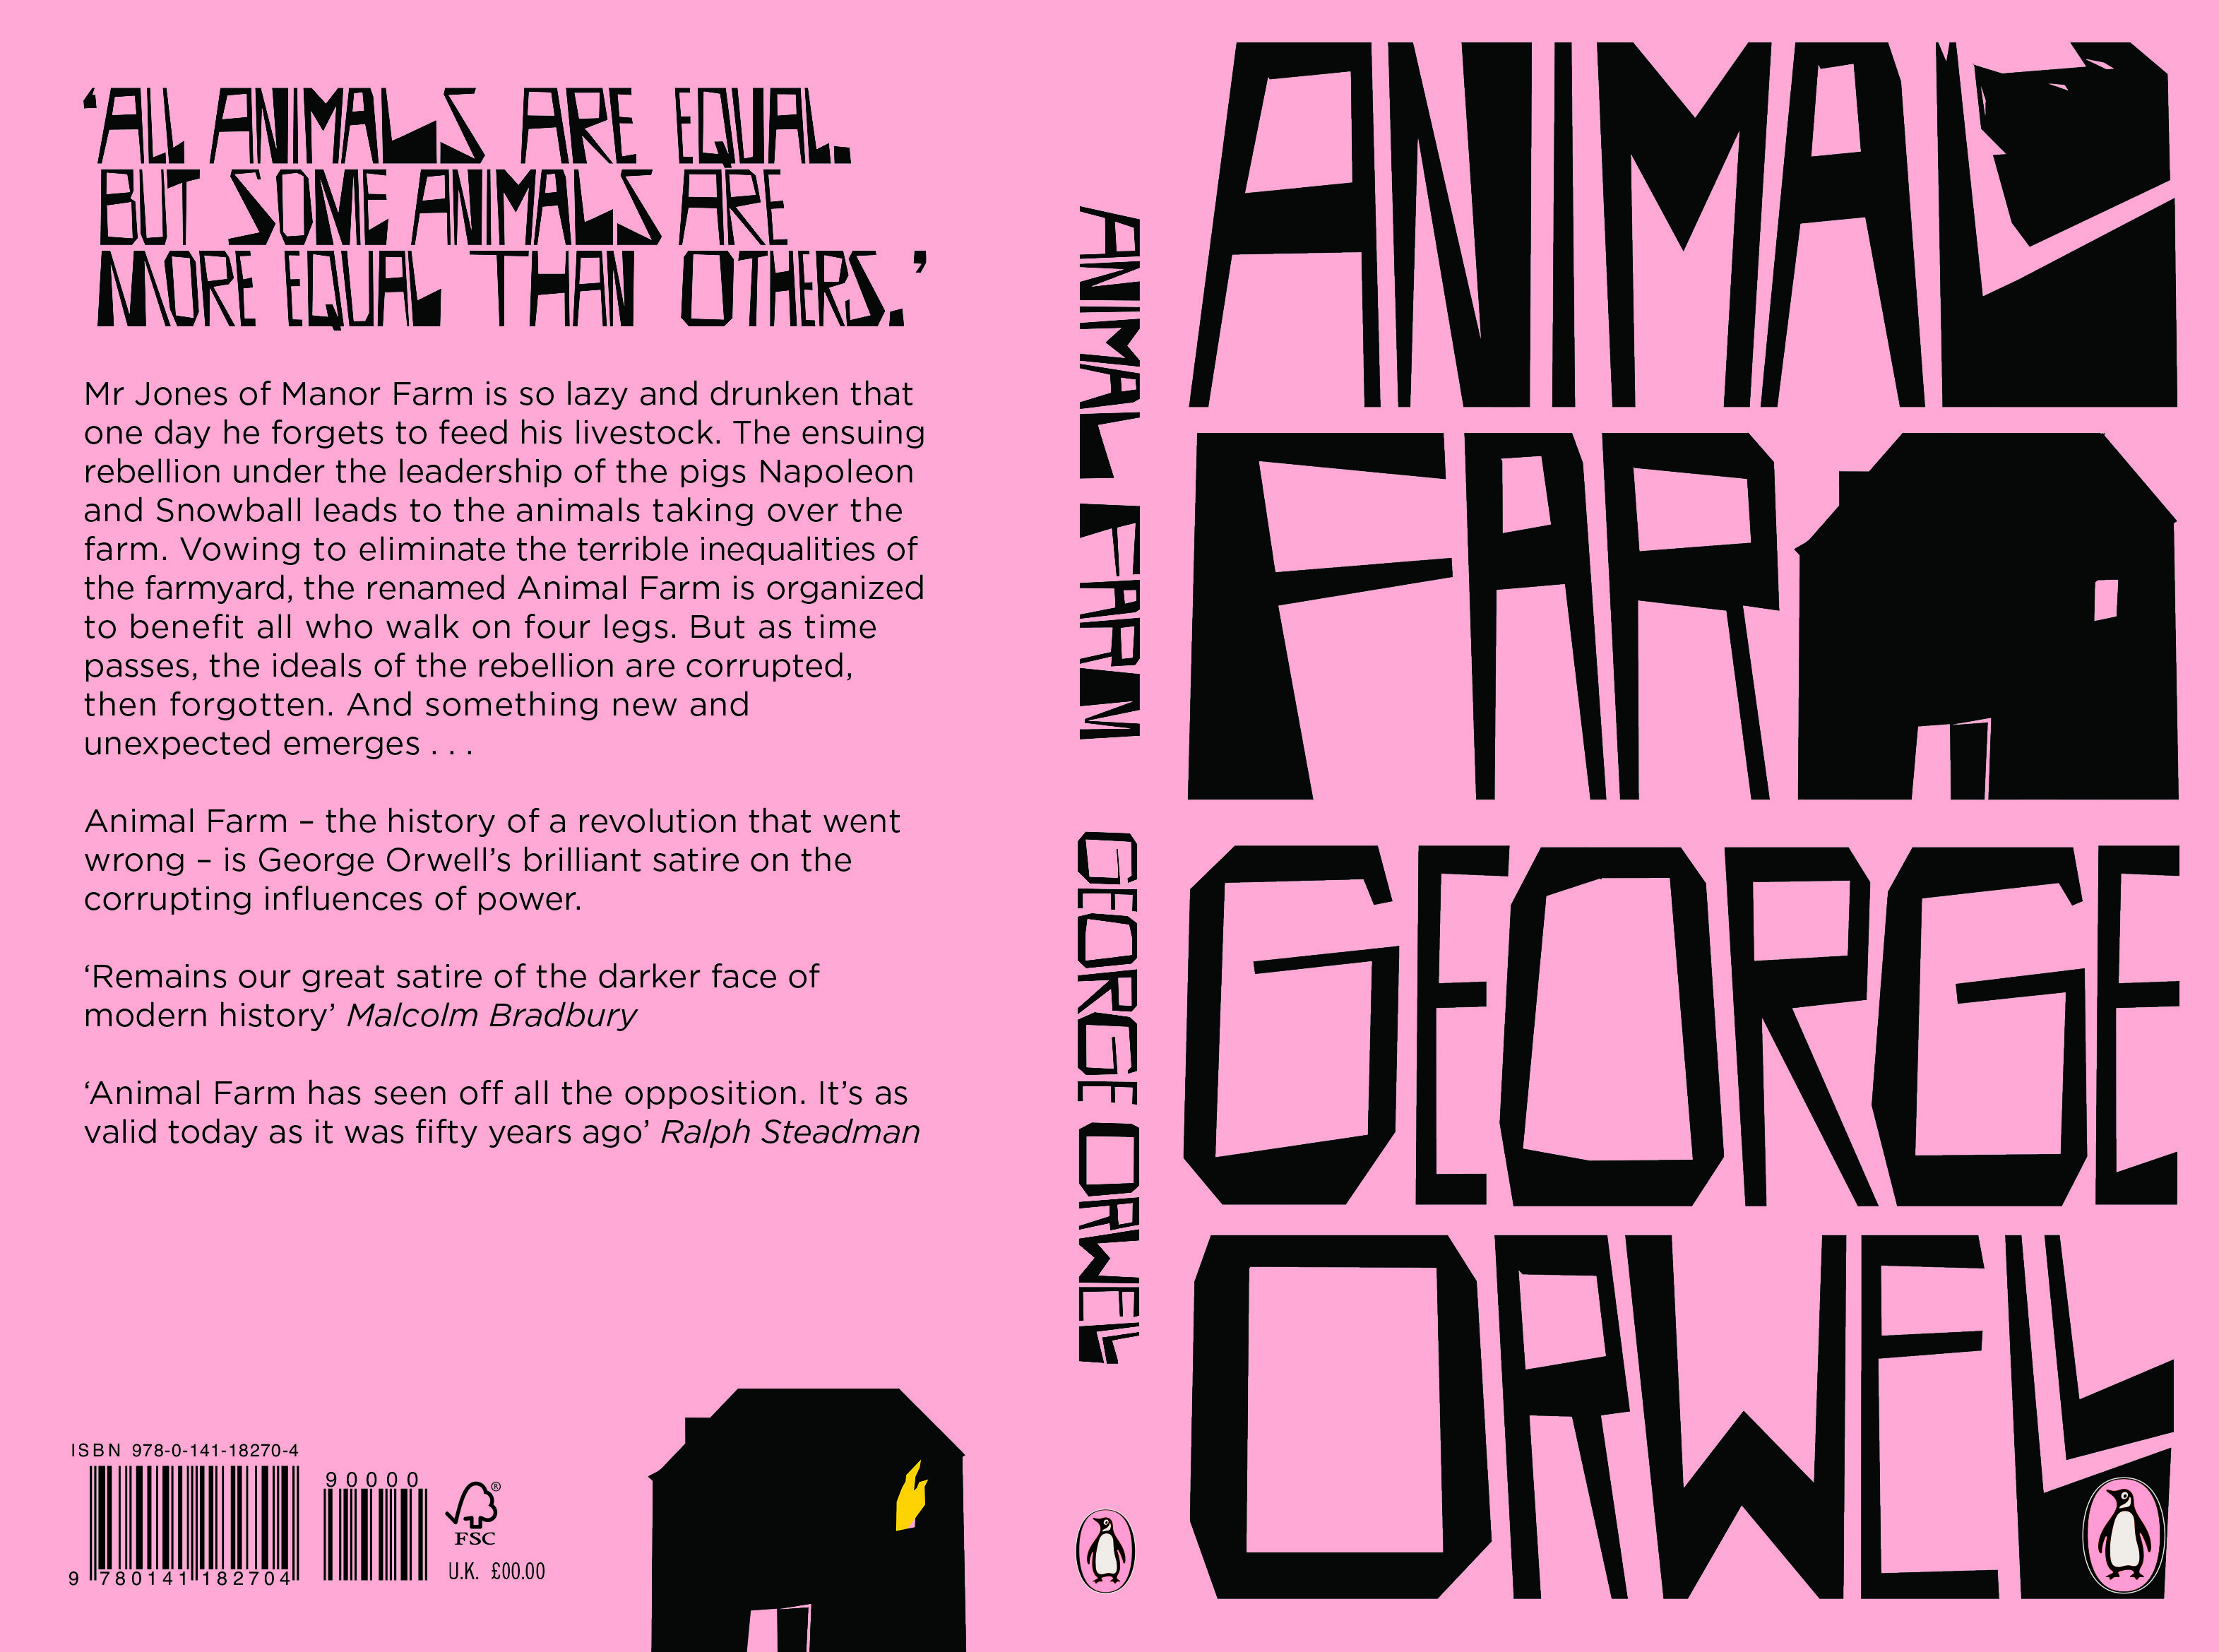 12+ Animal farm book cover ideas in 2021